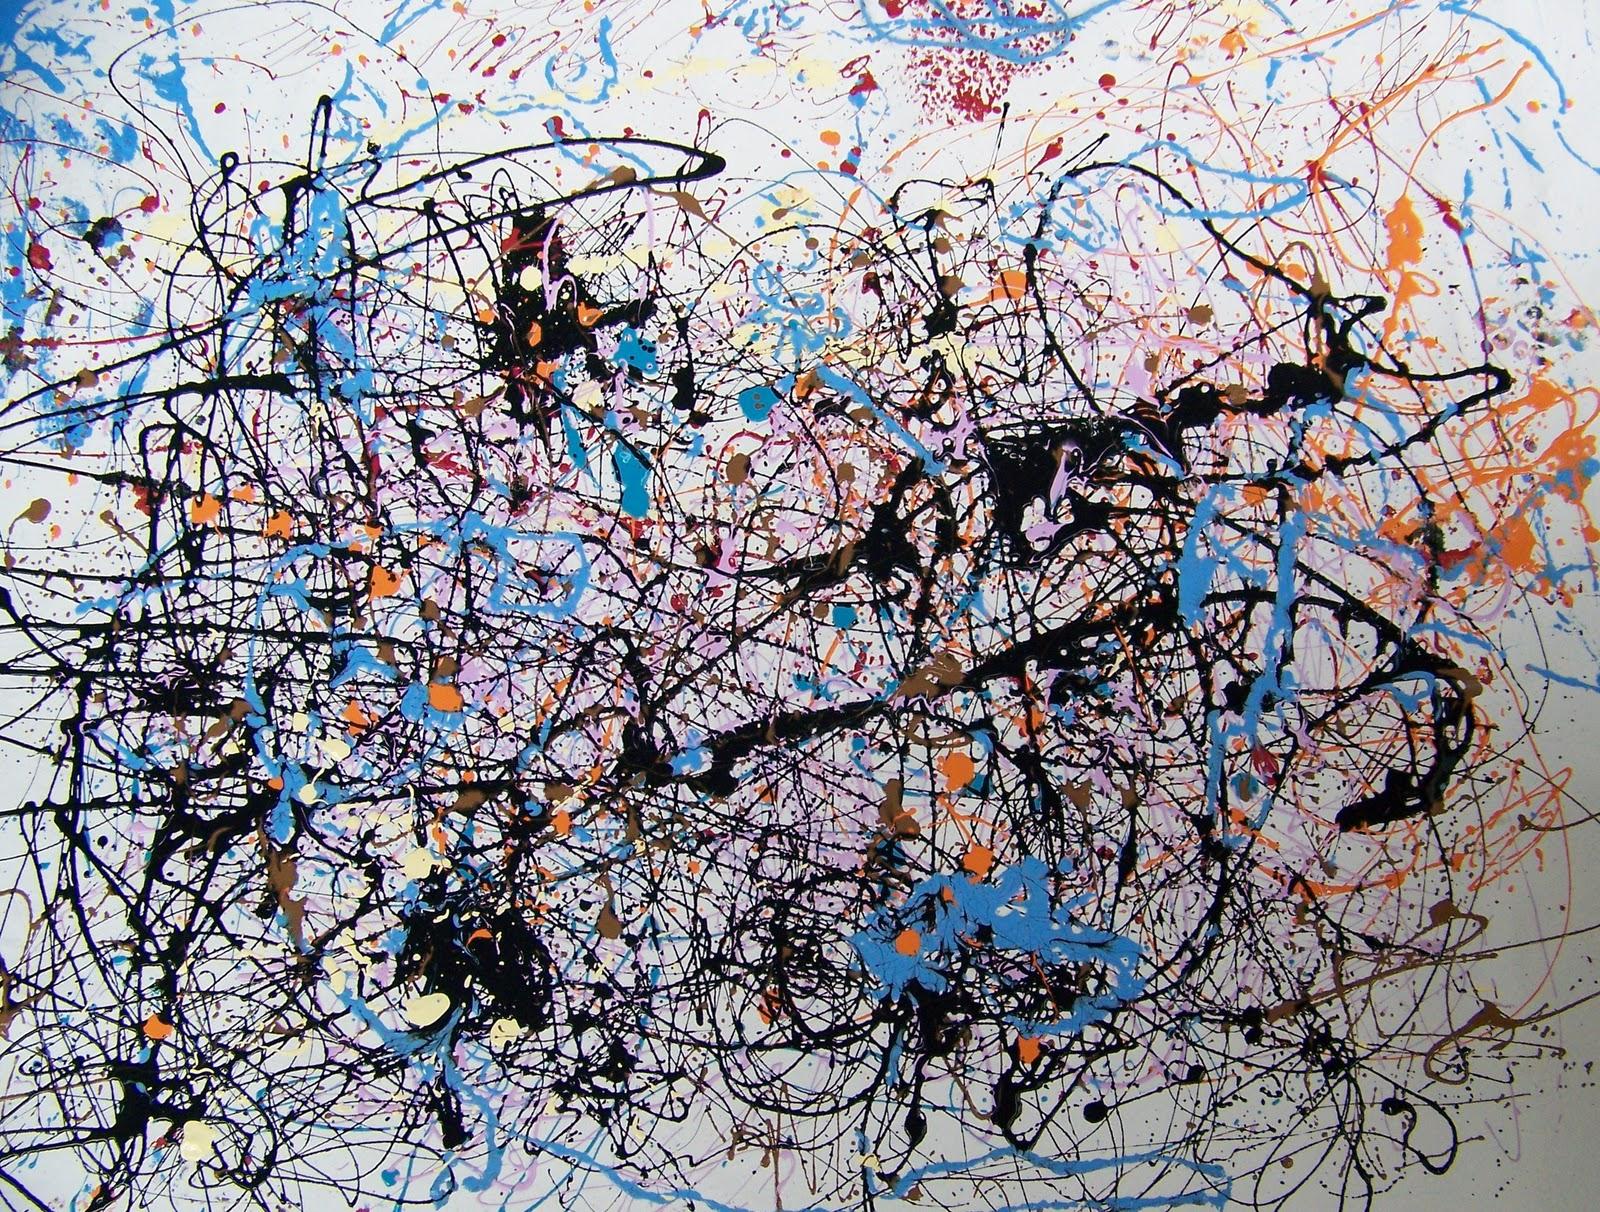 http://4.bp.blogspot.com/_wIIEWL-8LrE/TSxdFuGJFsI/AAAAAAAAGdU/tDZHWDqaeMs/s1600/Jackson+Pollock+workshop+by+jafagirls.JPG